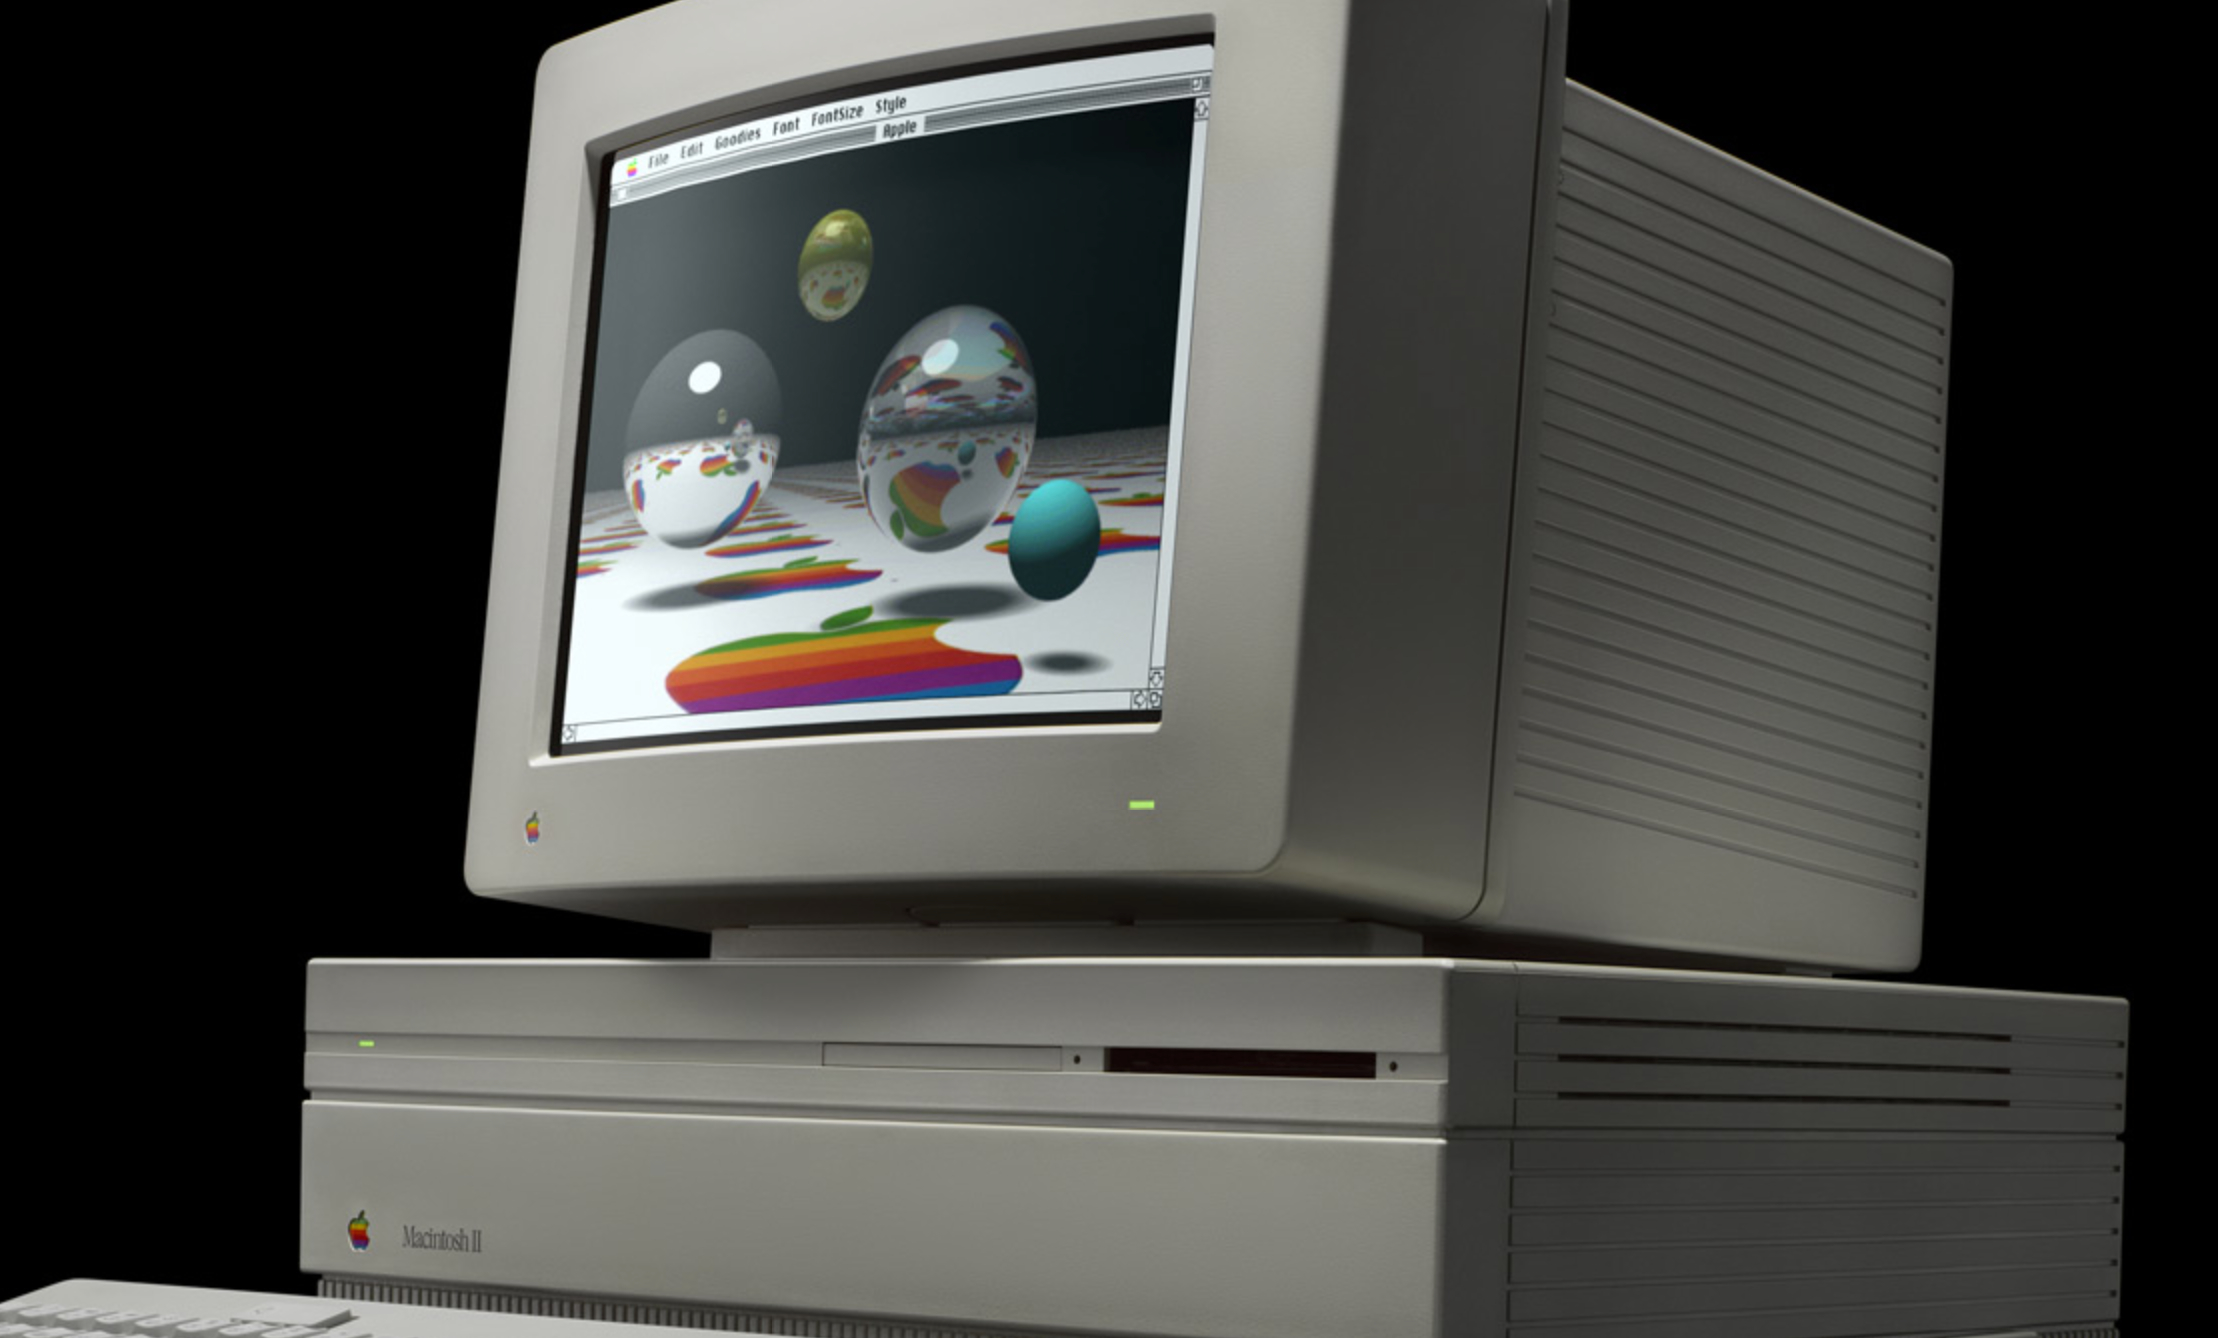 http://morristsai.com/blogpics/Apple_-_Thirty_Years_of_Mac_-_1987.jpg